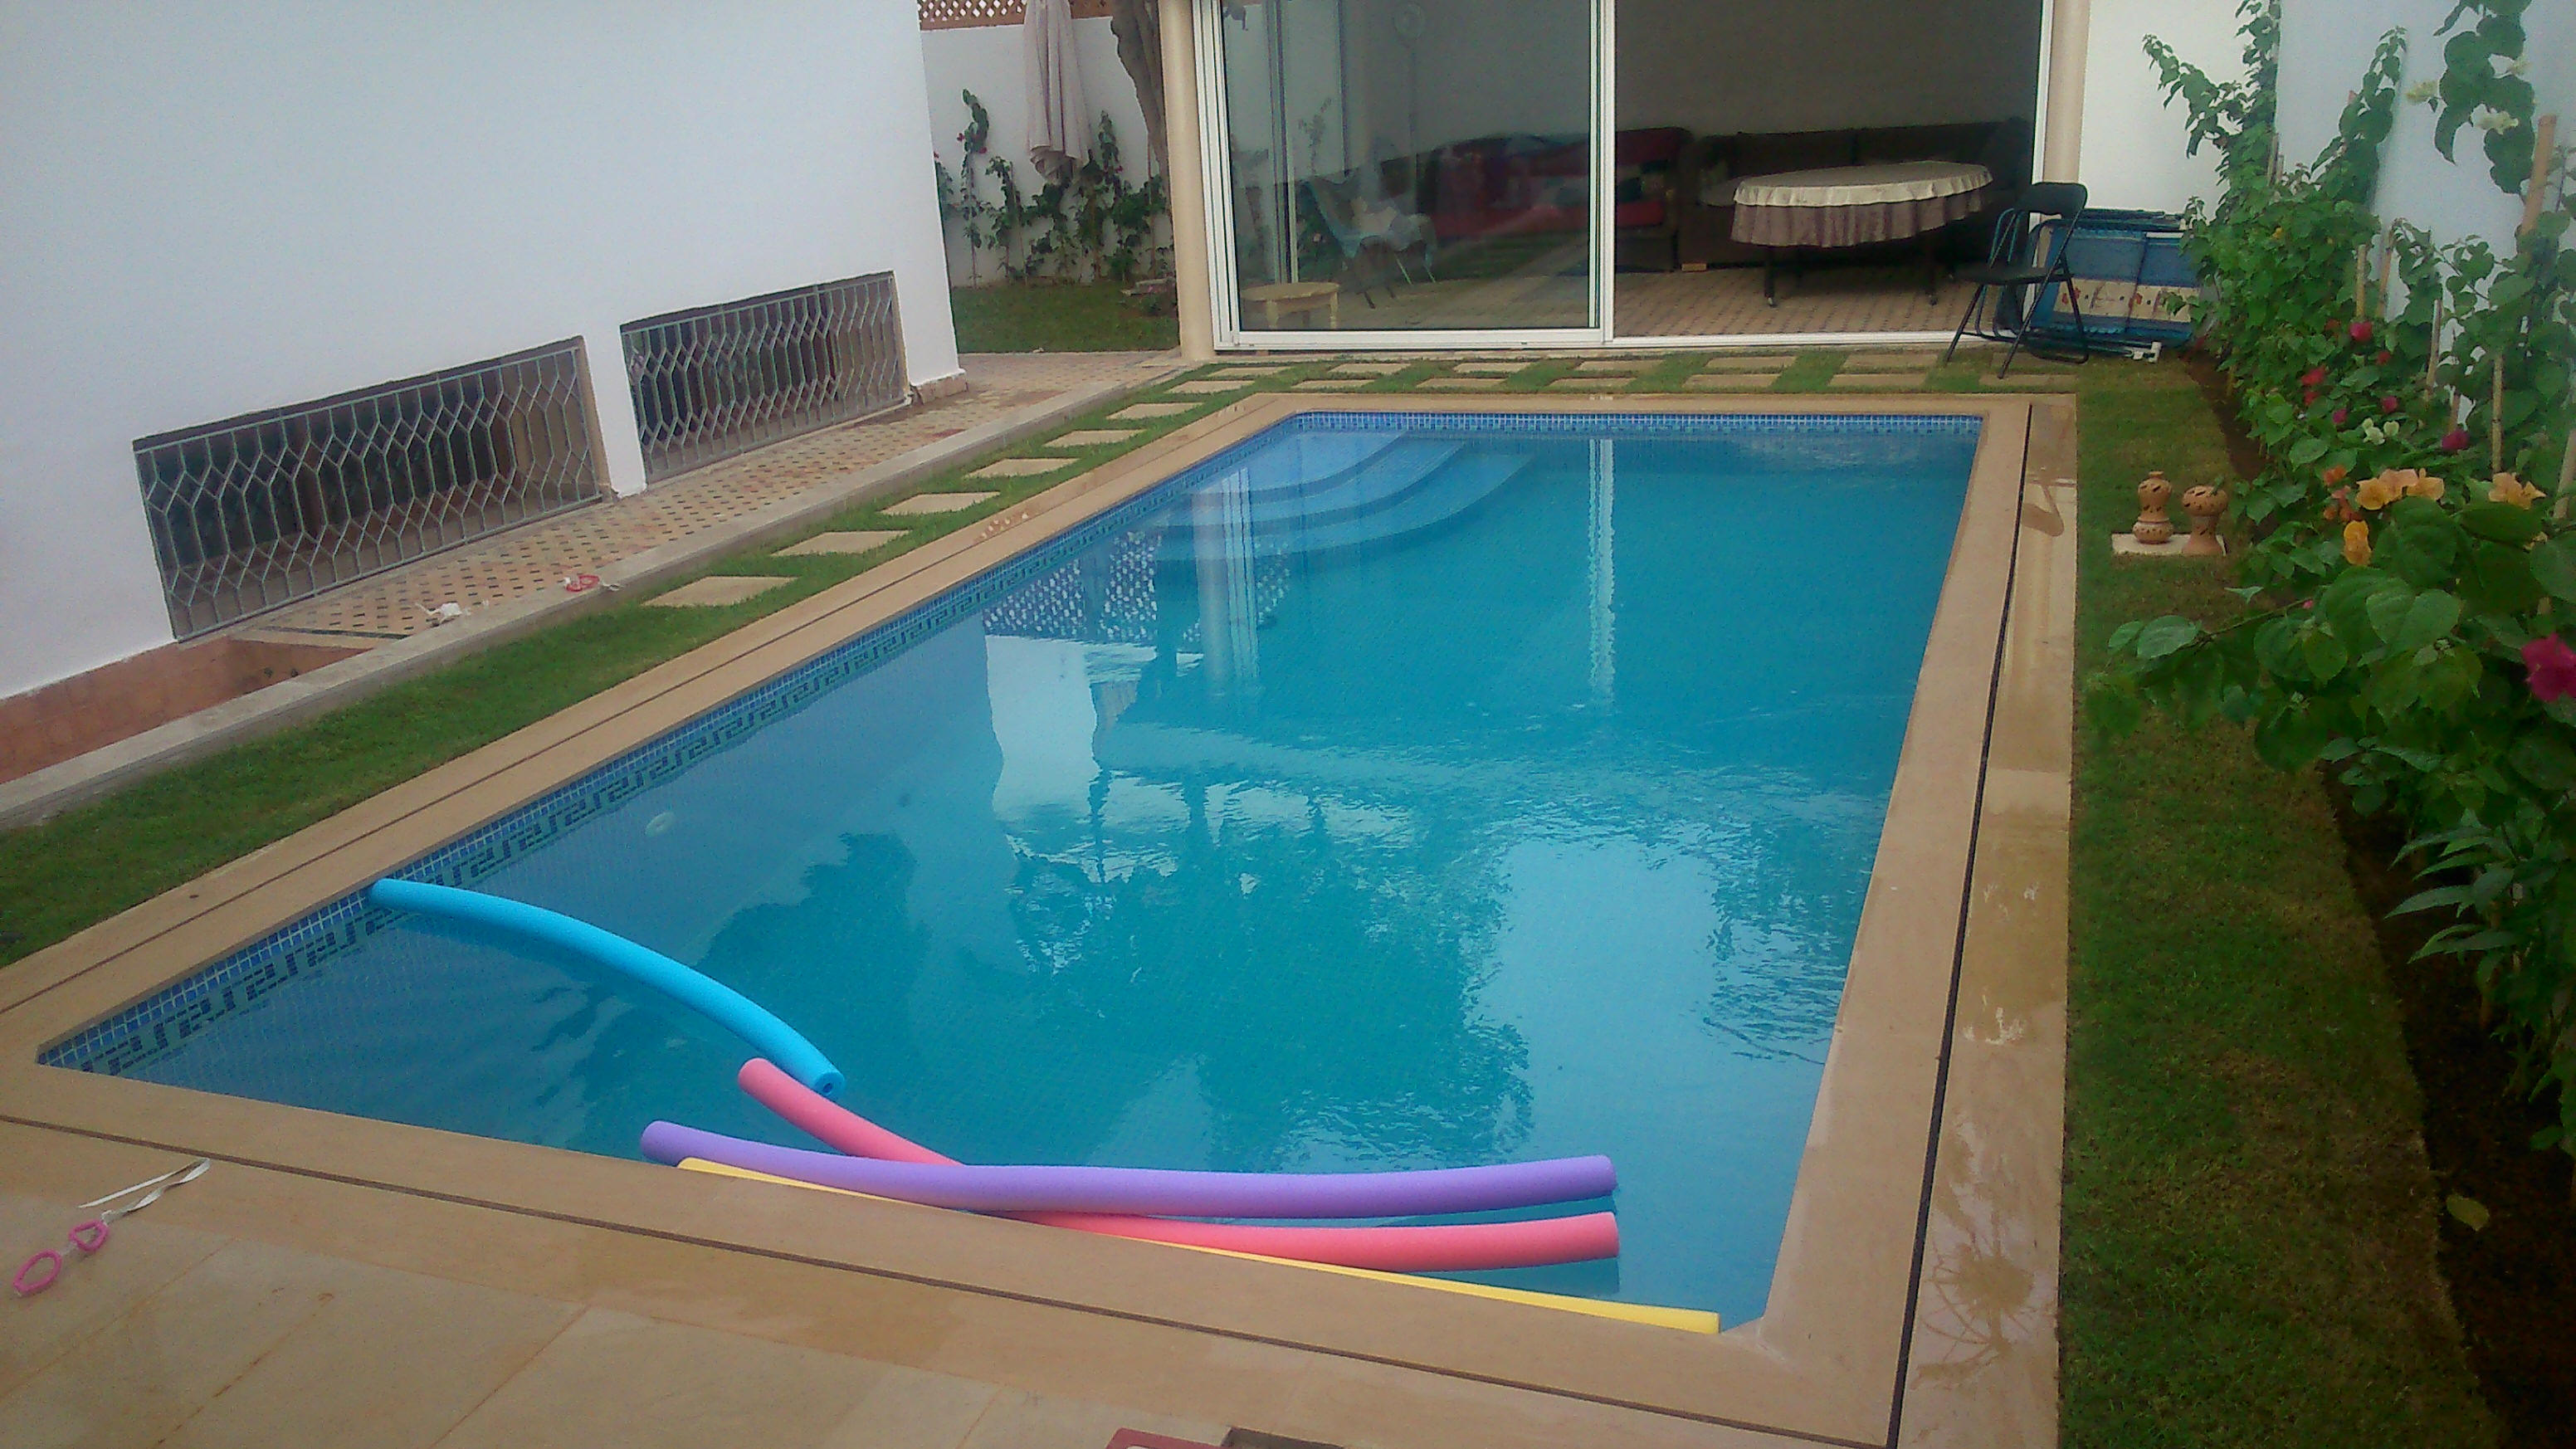 Les piscines chez isobati ma sarl maroc - Prix d une piscine en inox ...